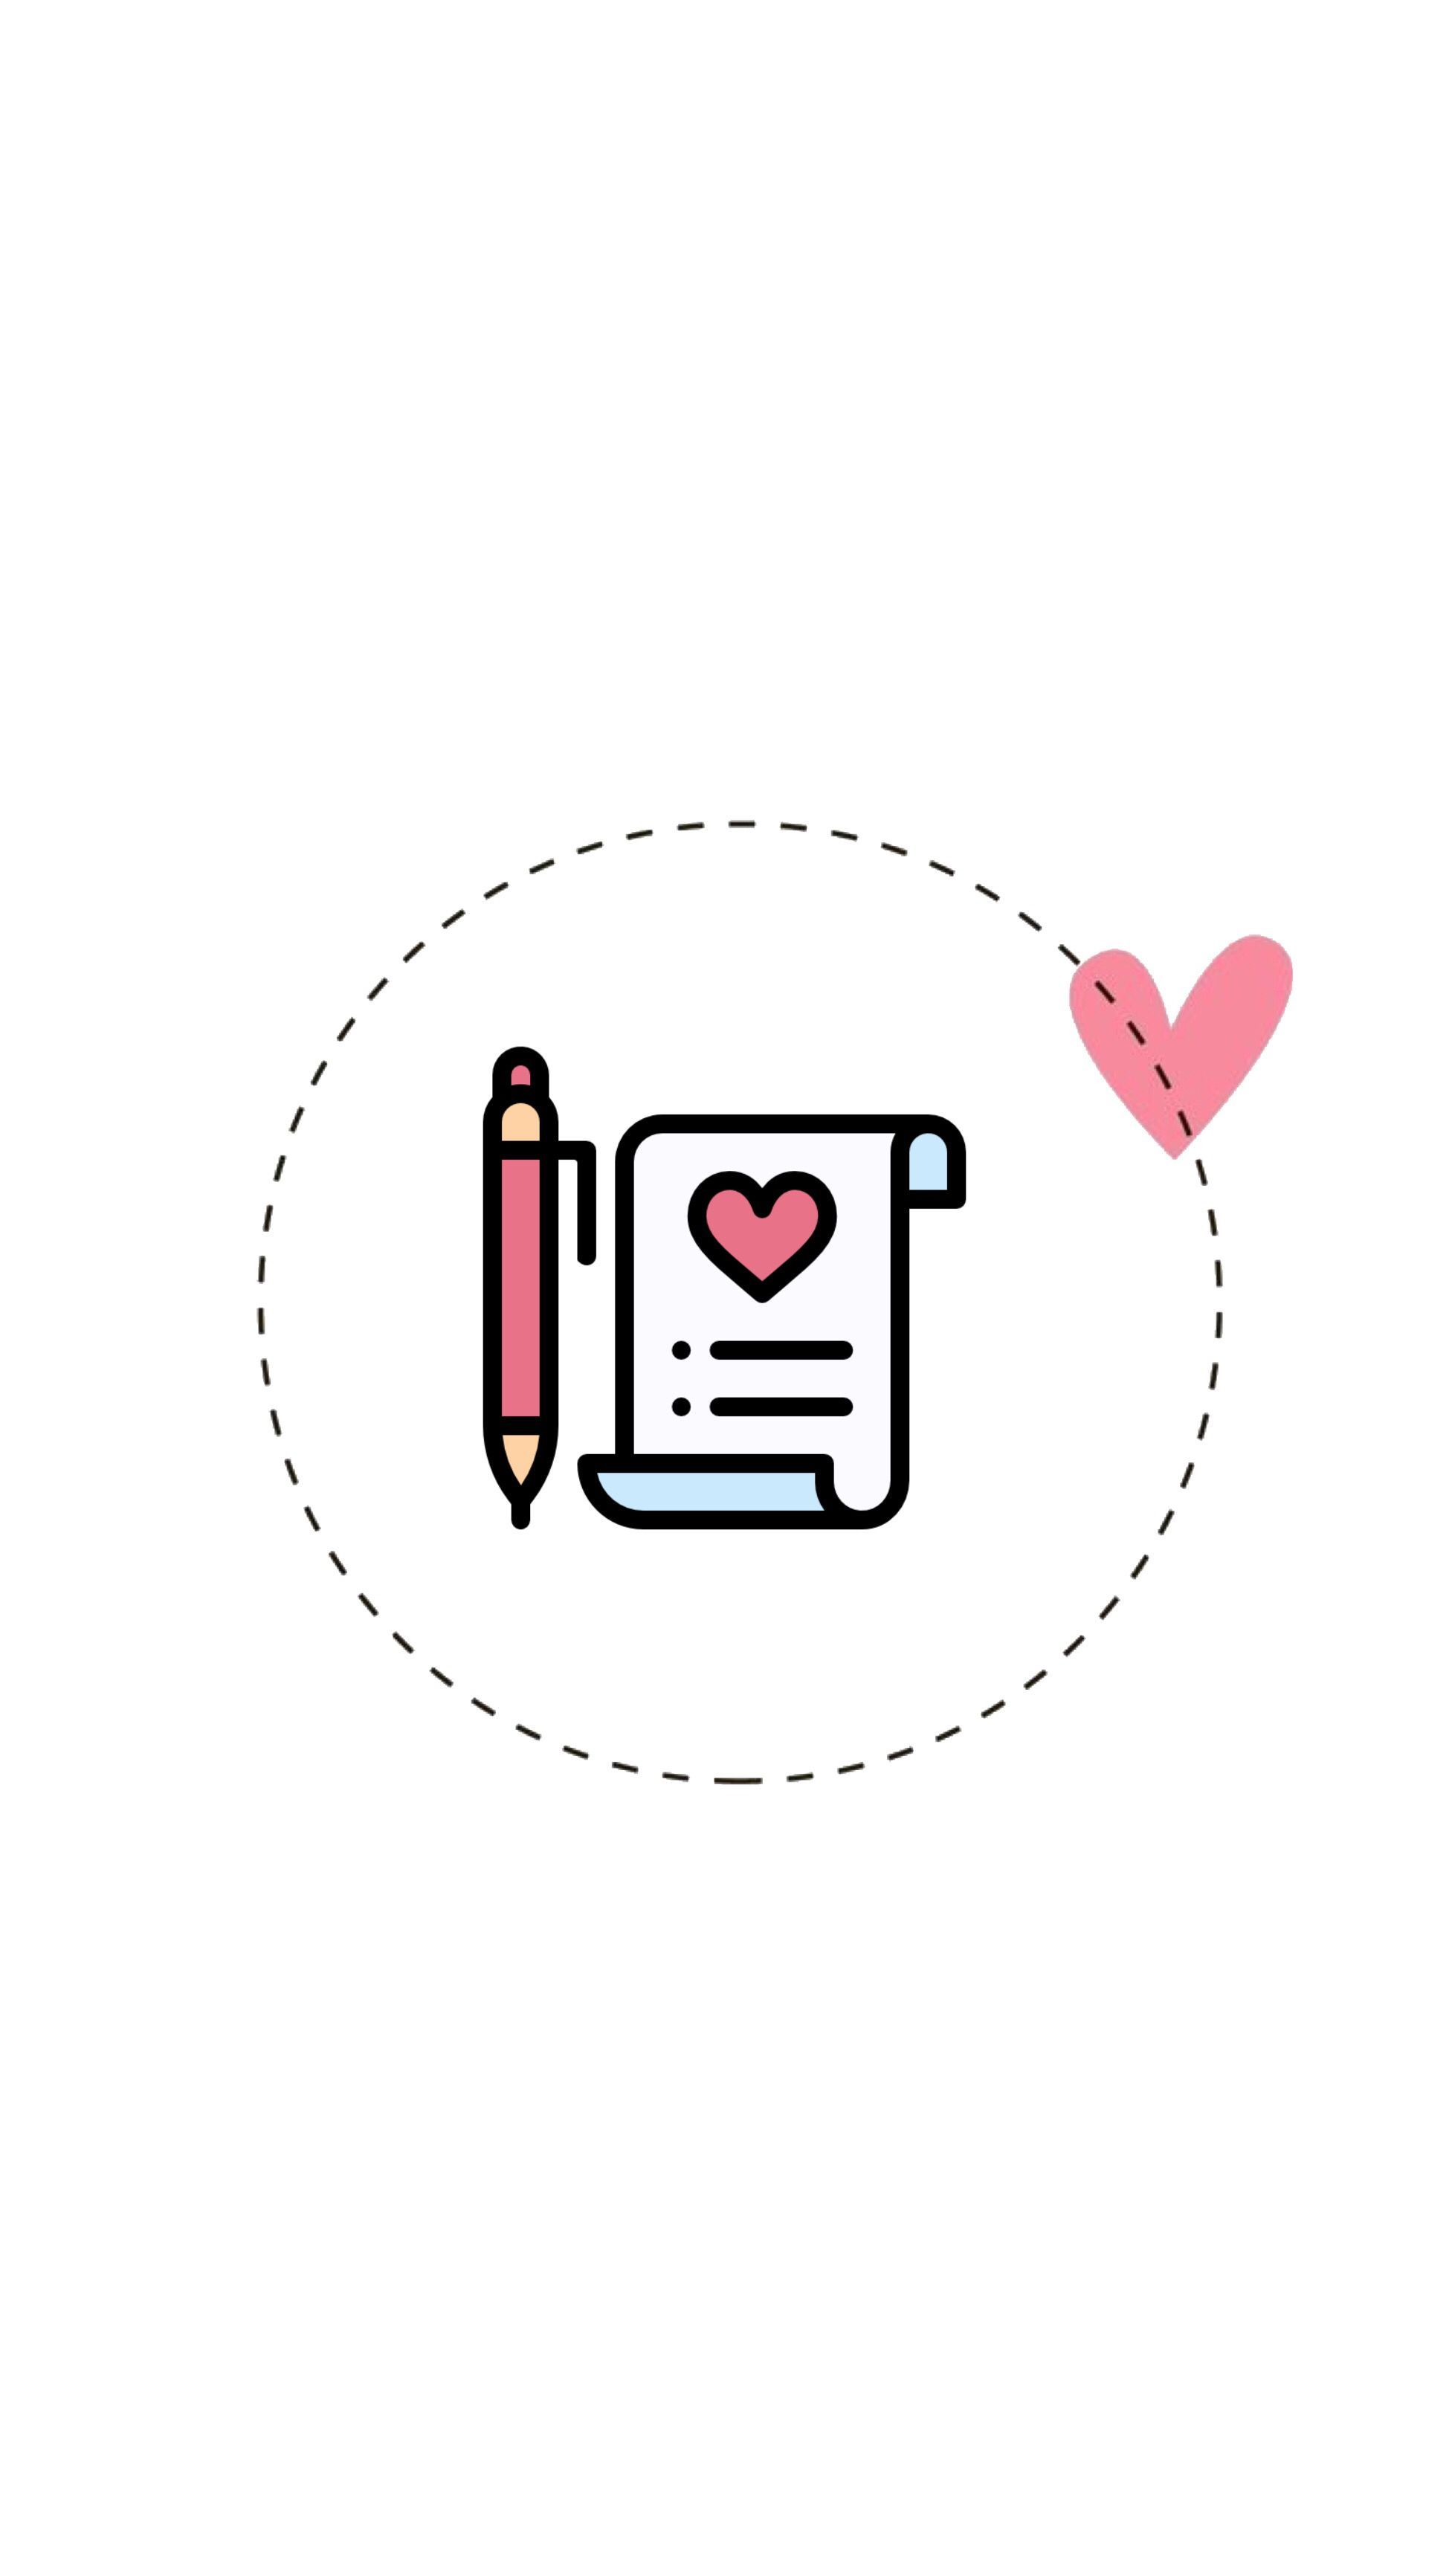 Logo Olshop Kosongan : olshop, kosongan, Olshop, Instagram, Logo,, Insta, Icon,, Story